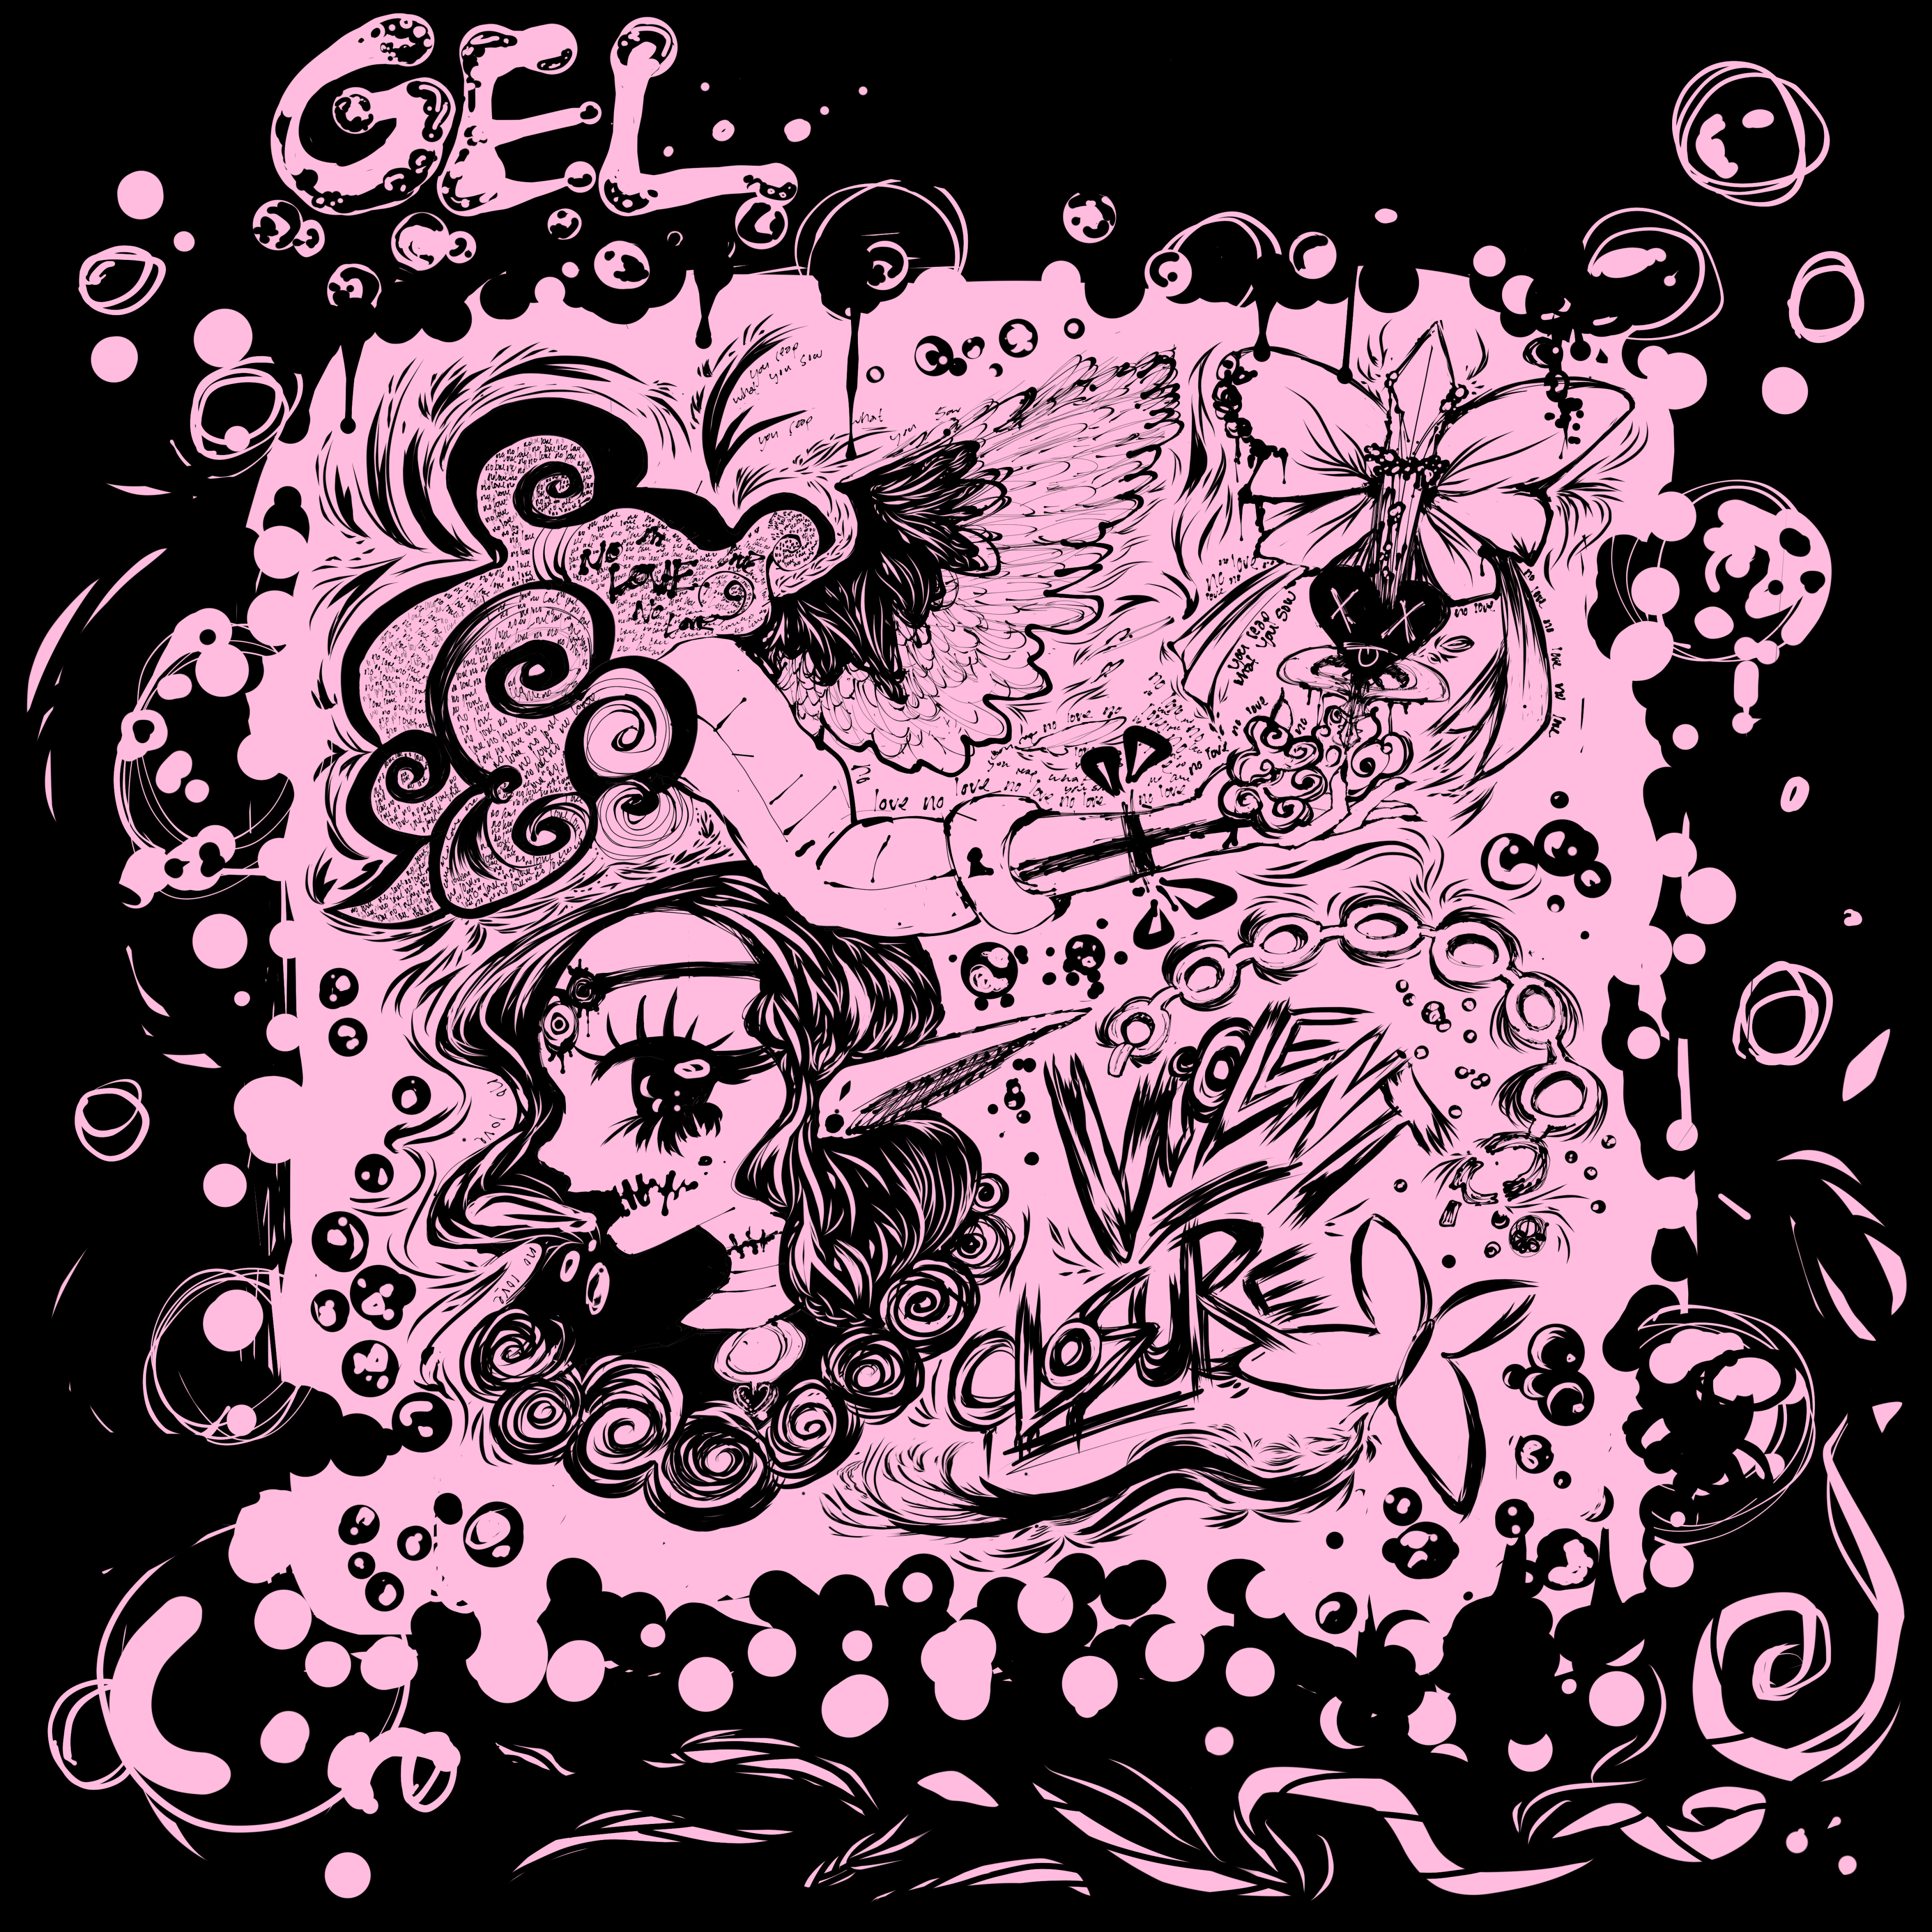 Gel - Violent Closure 7